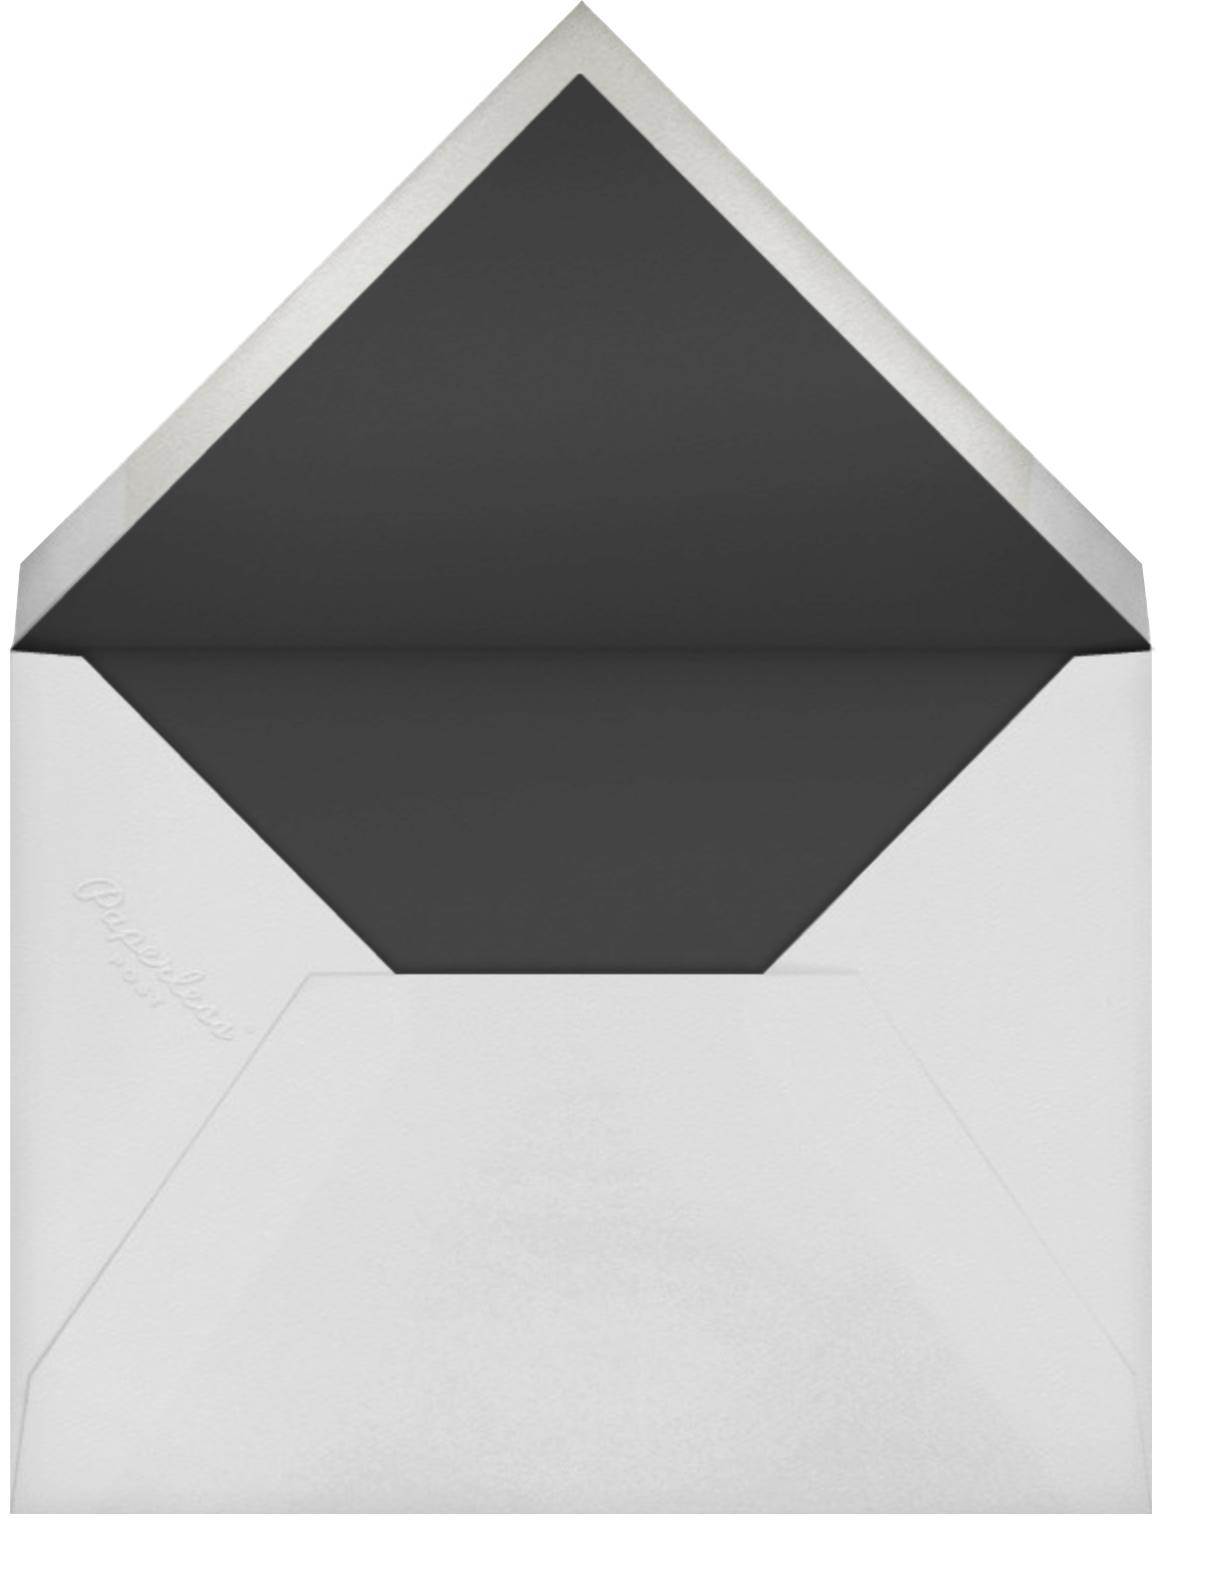 Amador (Invitation) - Paperless Post - Envelope